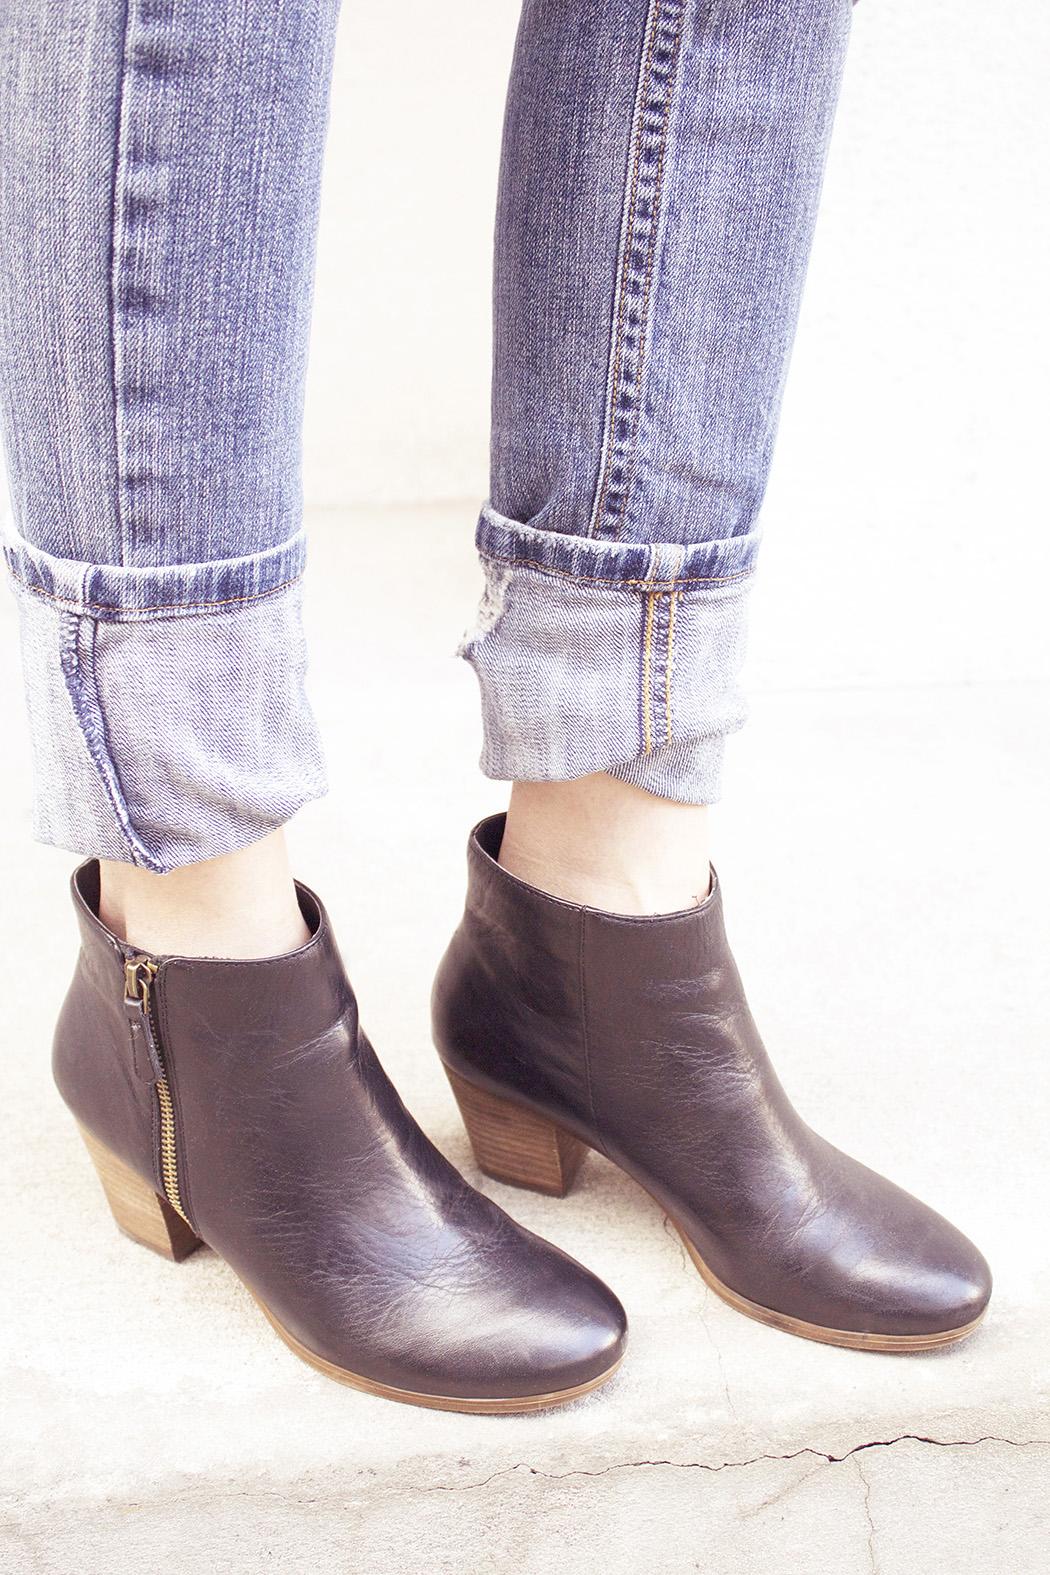 Crown-vintage-boots